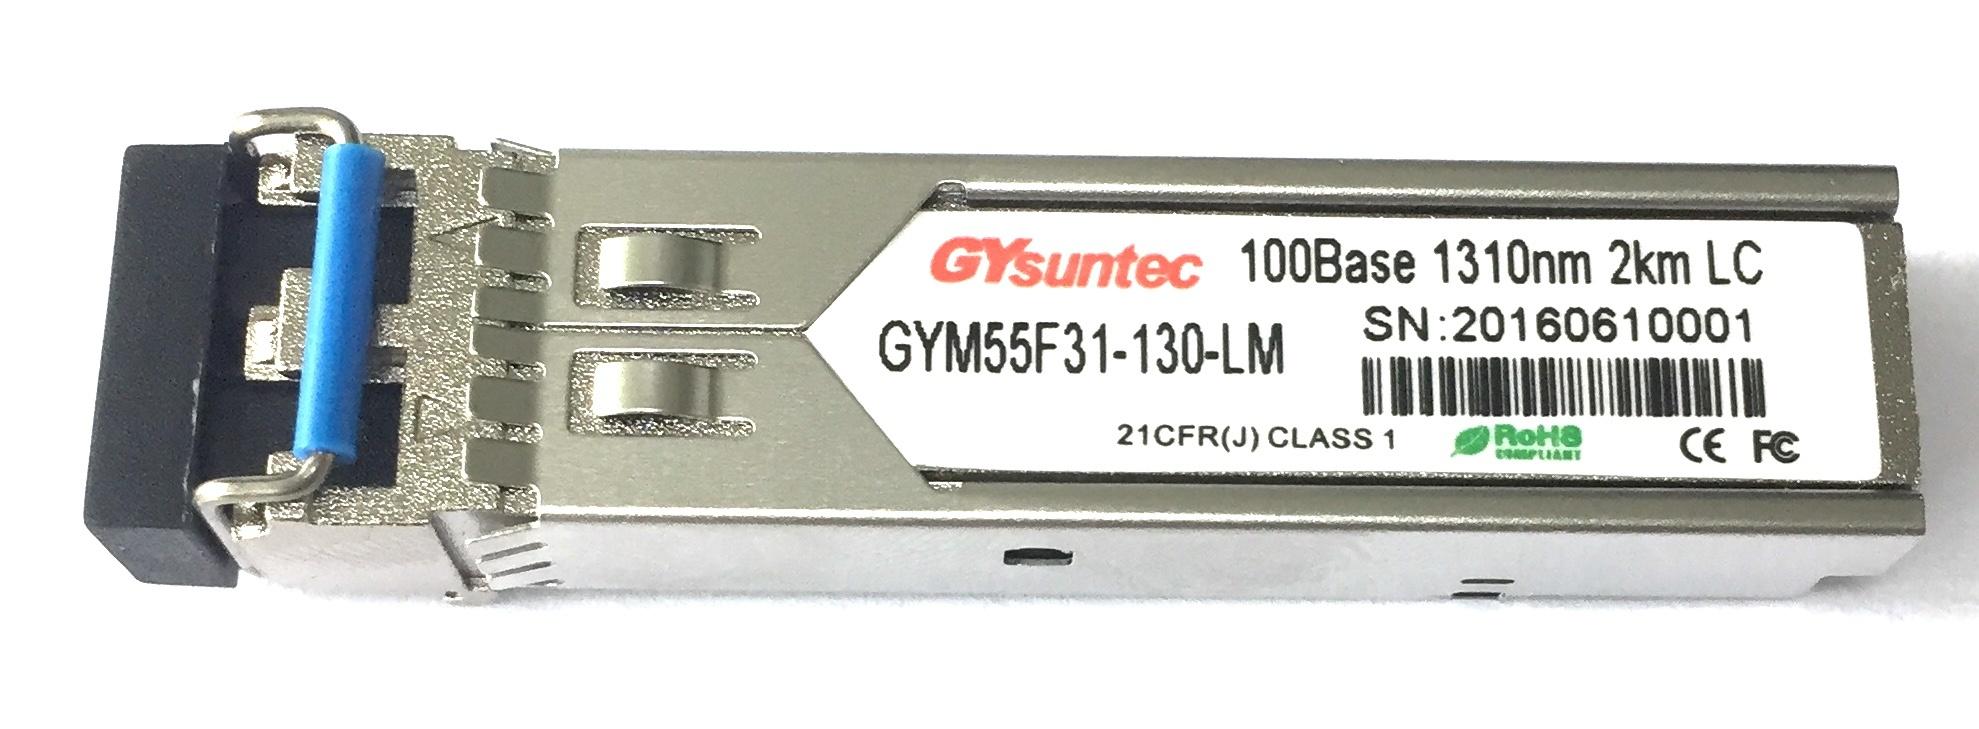 Wholesale Fiber Optic Transmission Buy Reliable 16v1d Rack 1u Analog Video Transceiver Cctv Media Converter Sm 155m 1550nm Sfp Module 80km